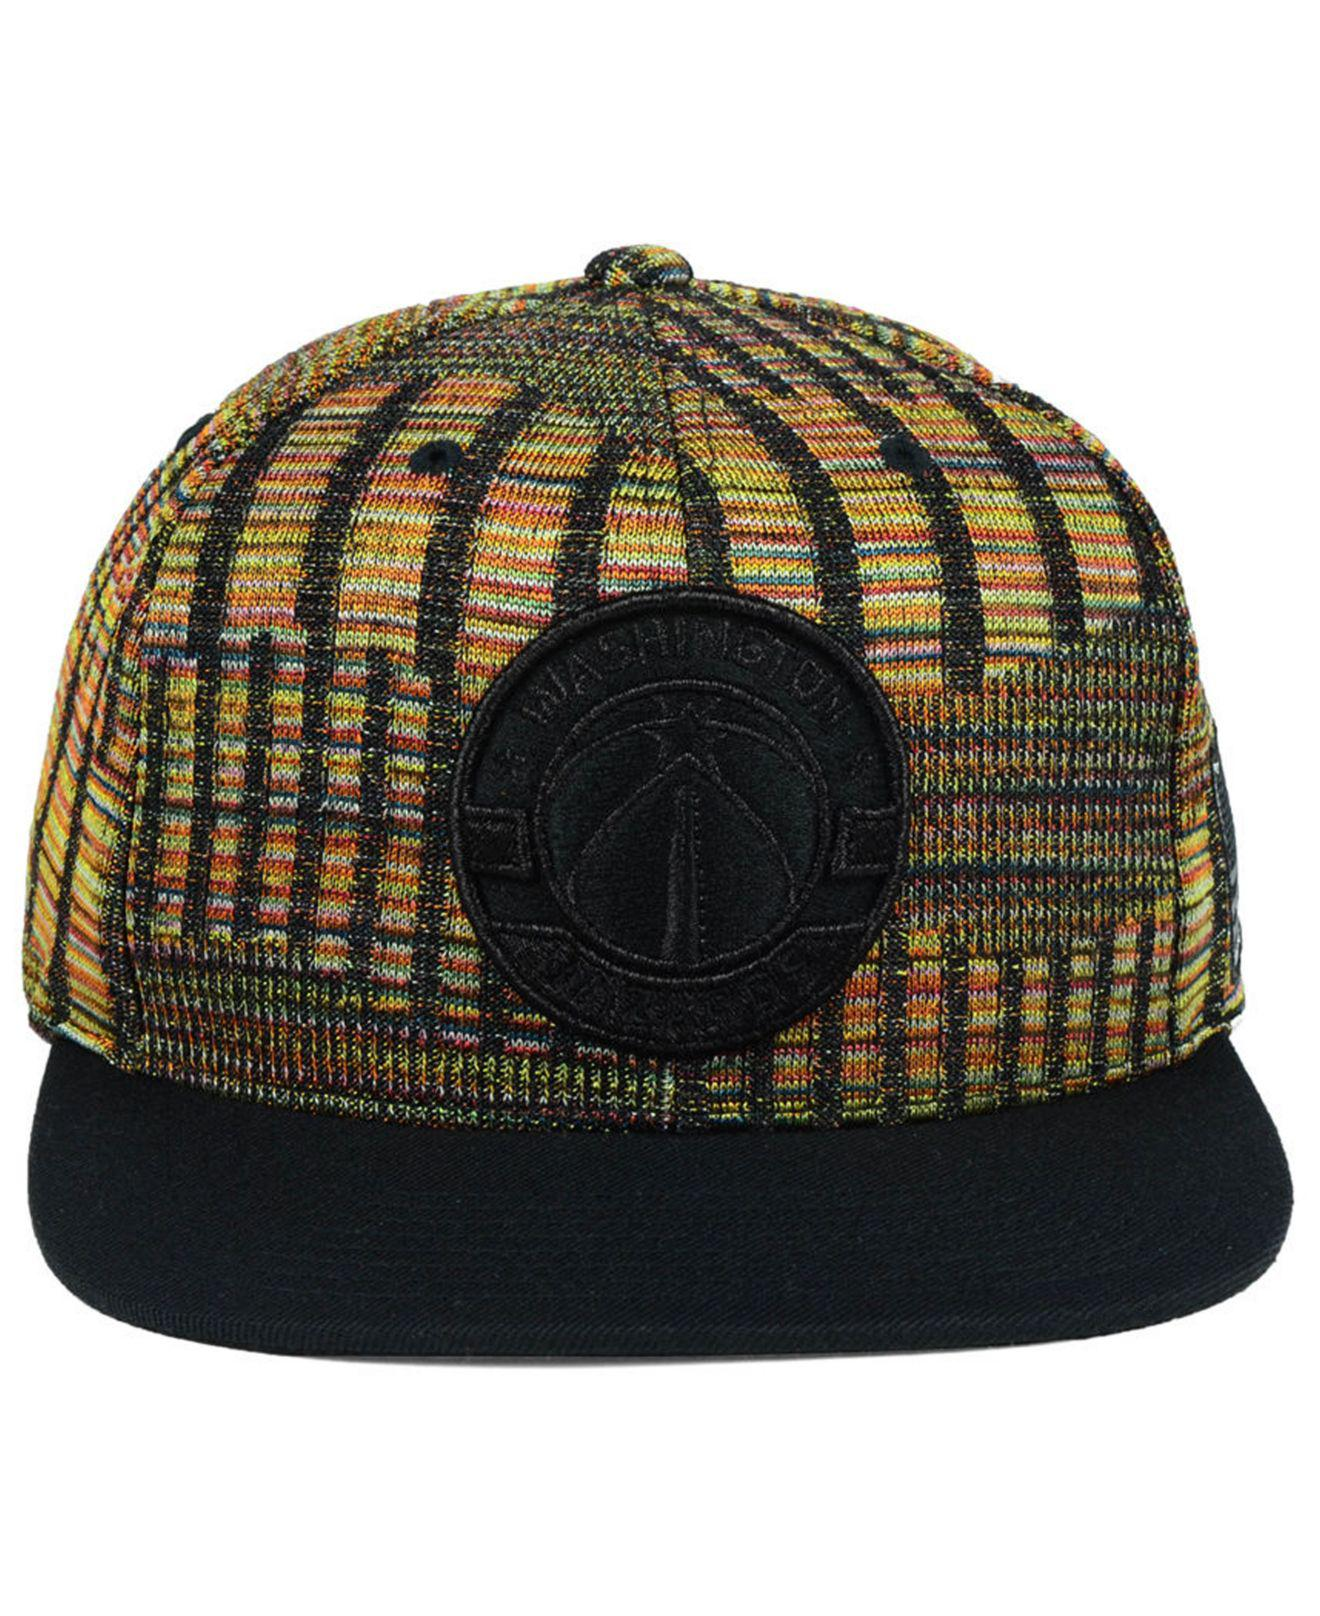 size 40 de220 a7182 Mitchell   Ness Washington Wizards Black Flag Snapback Cap in Black for Men  - Lyst